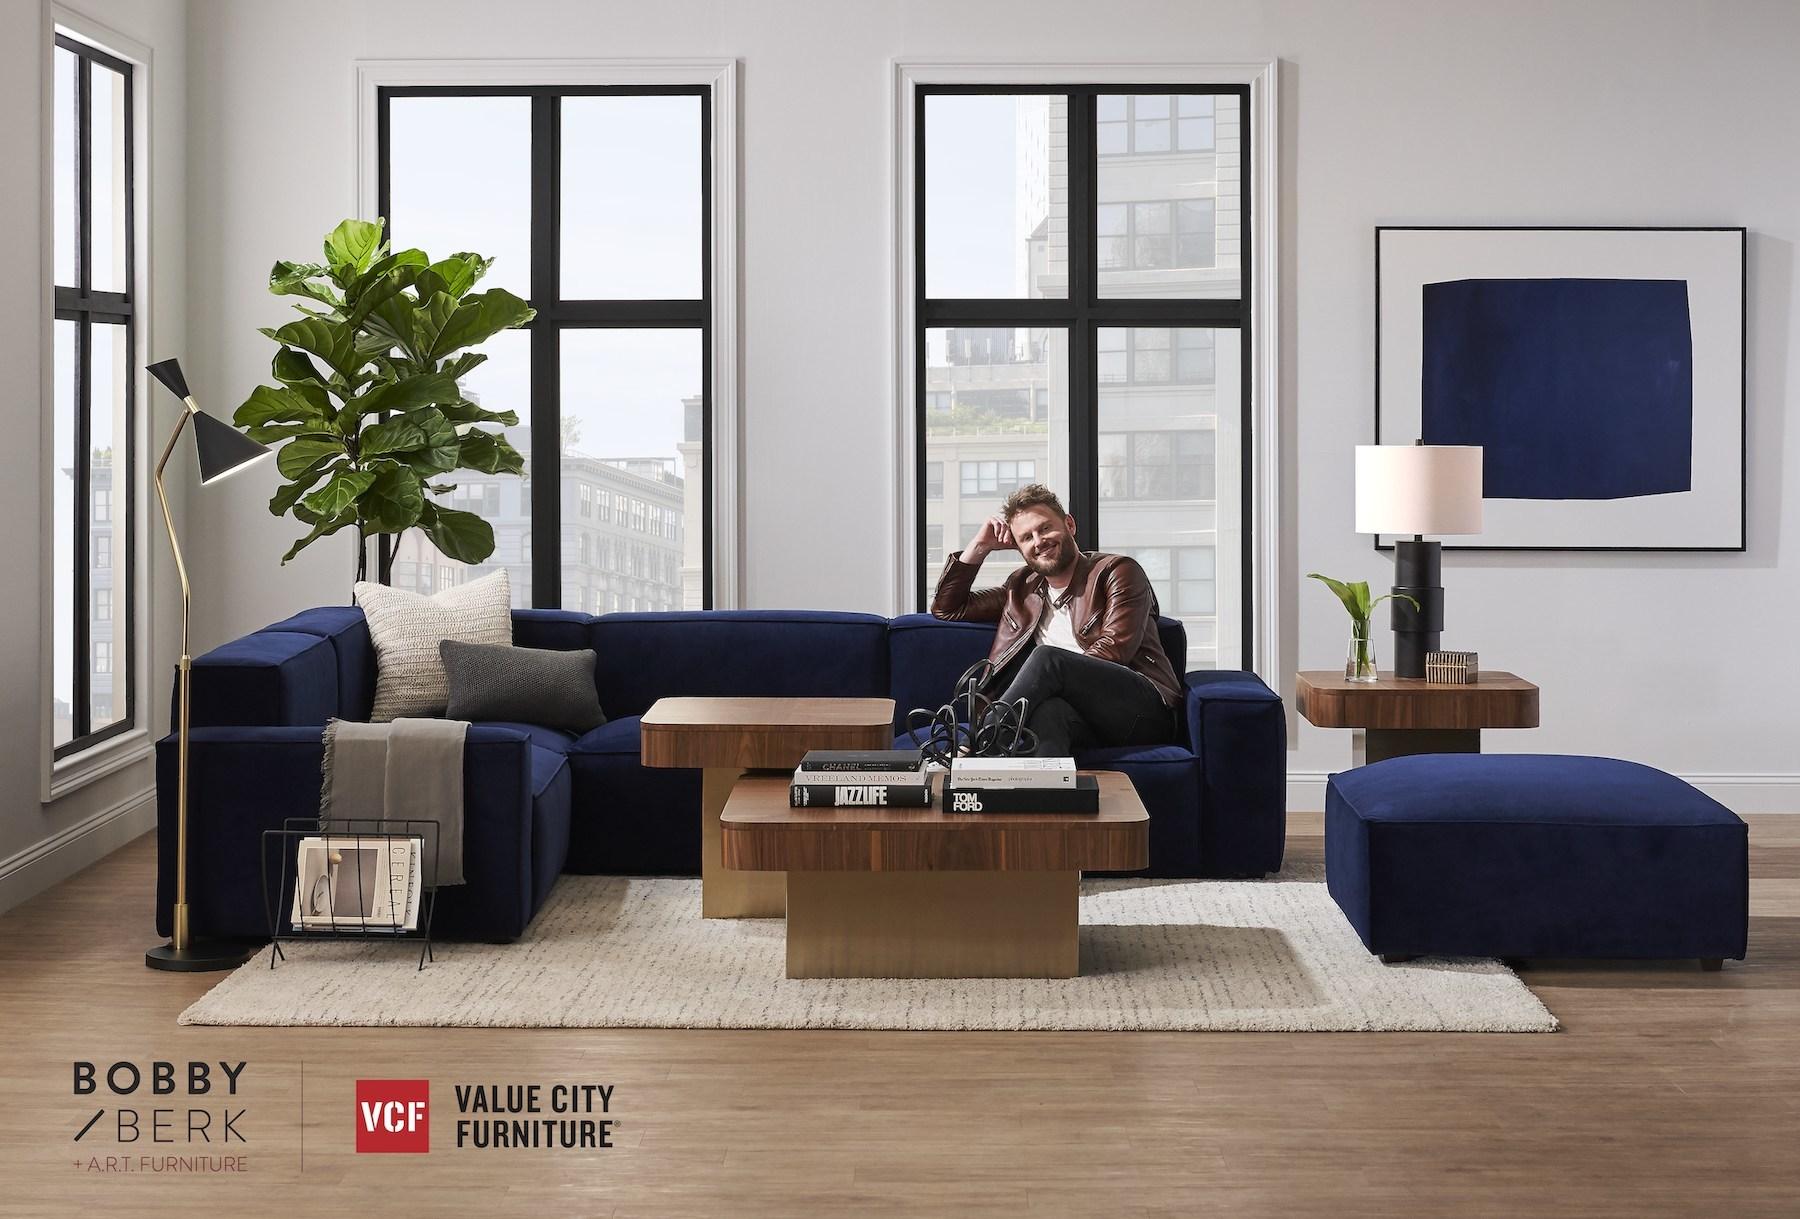 Value City Furniture, American Signature Furniture announces Bobby